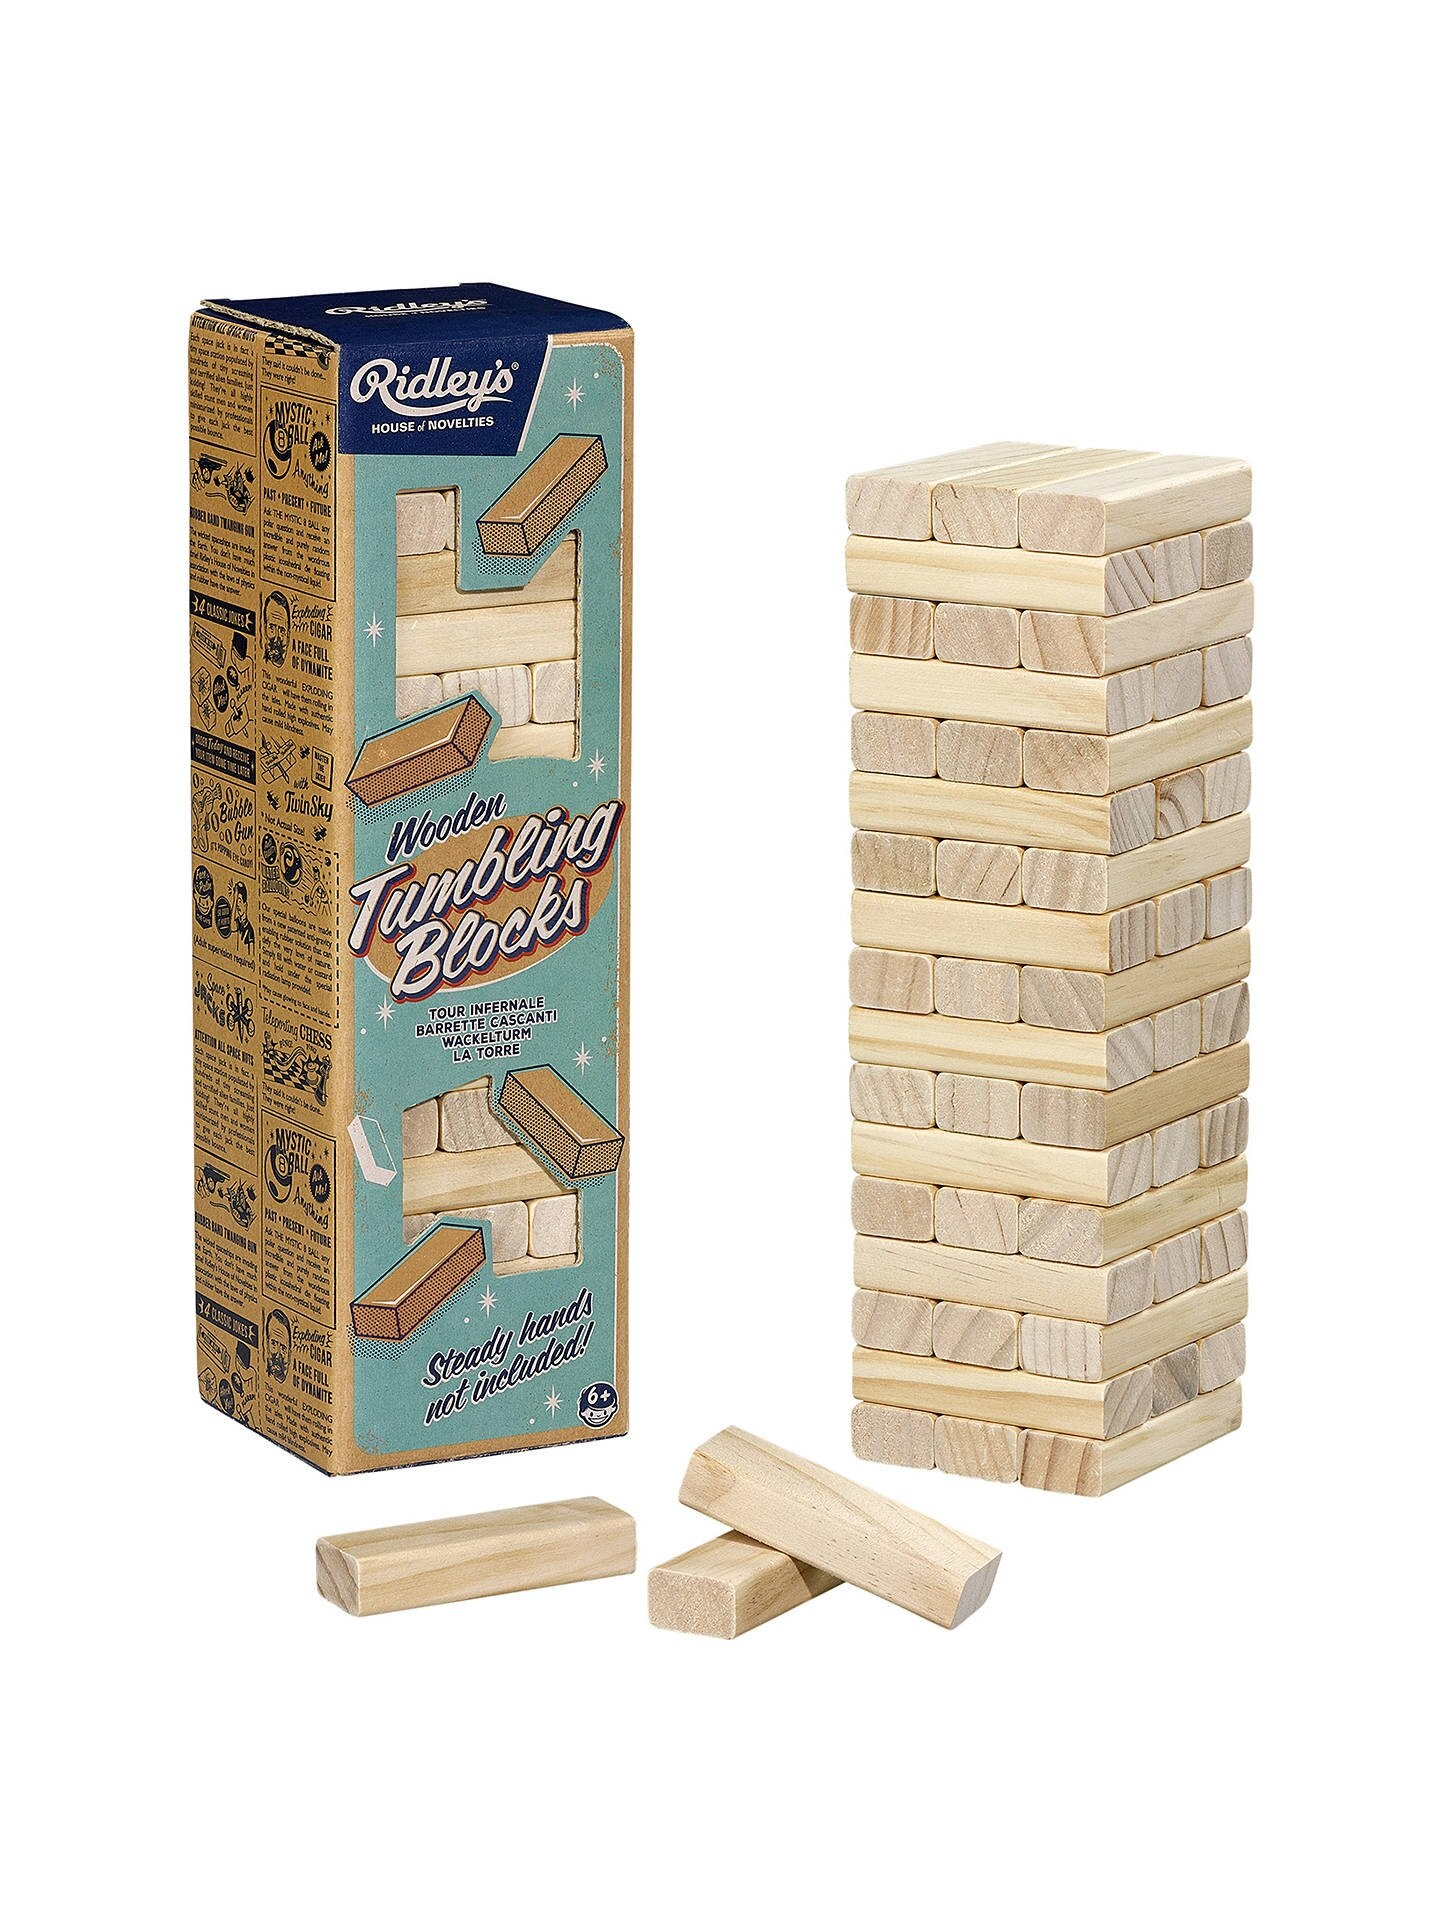 Ridley's Tumbling Blocks